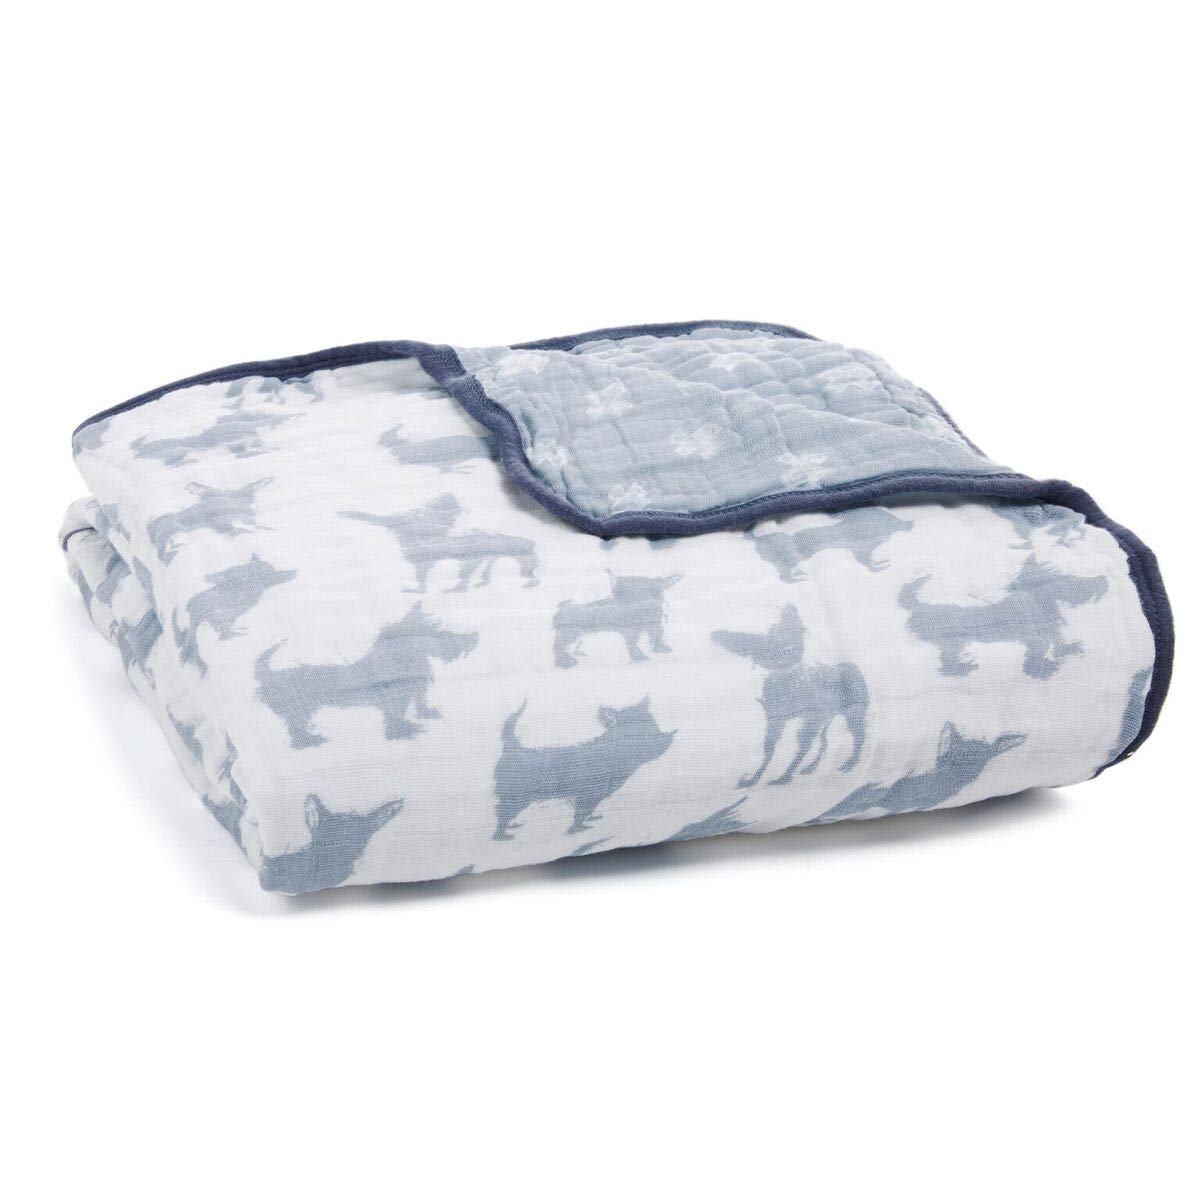 aden + anais Dream Blanket | Boutique Muslin Baby Blankets for Girls & Boys | Ideal Lightweight Newborn Nursery & Crib Blanket | Unisex Toddler & Infant Bedding, Shower & Registry Gift, Waverly, Dog by aden + anais